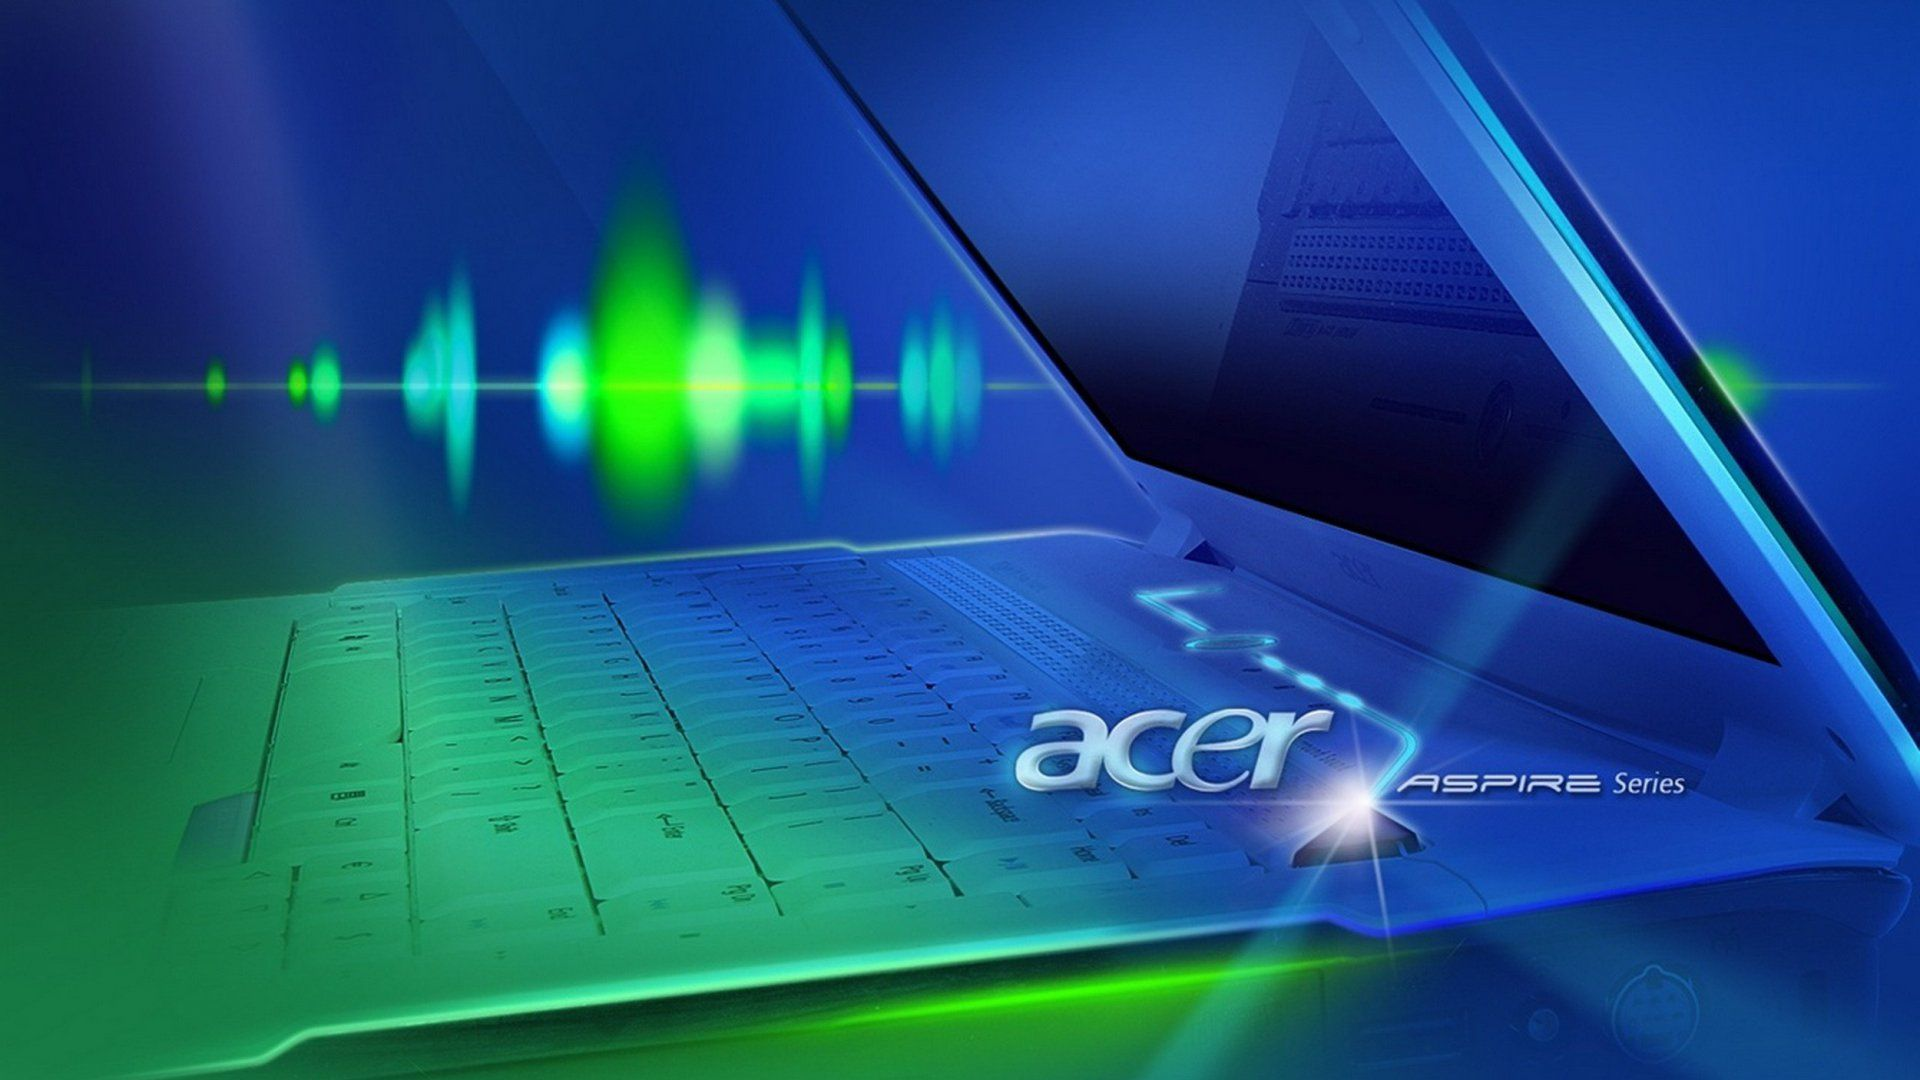 Acer free image